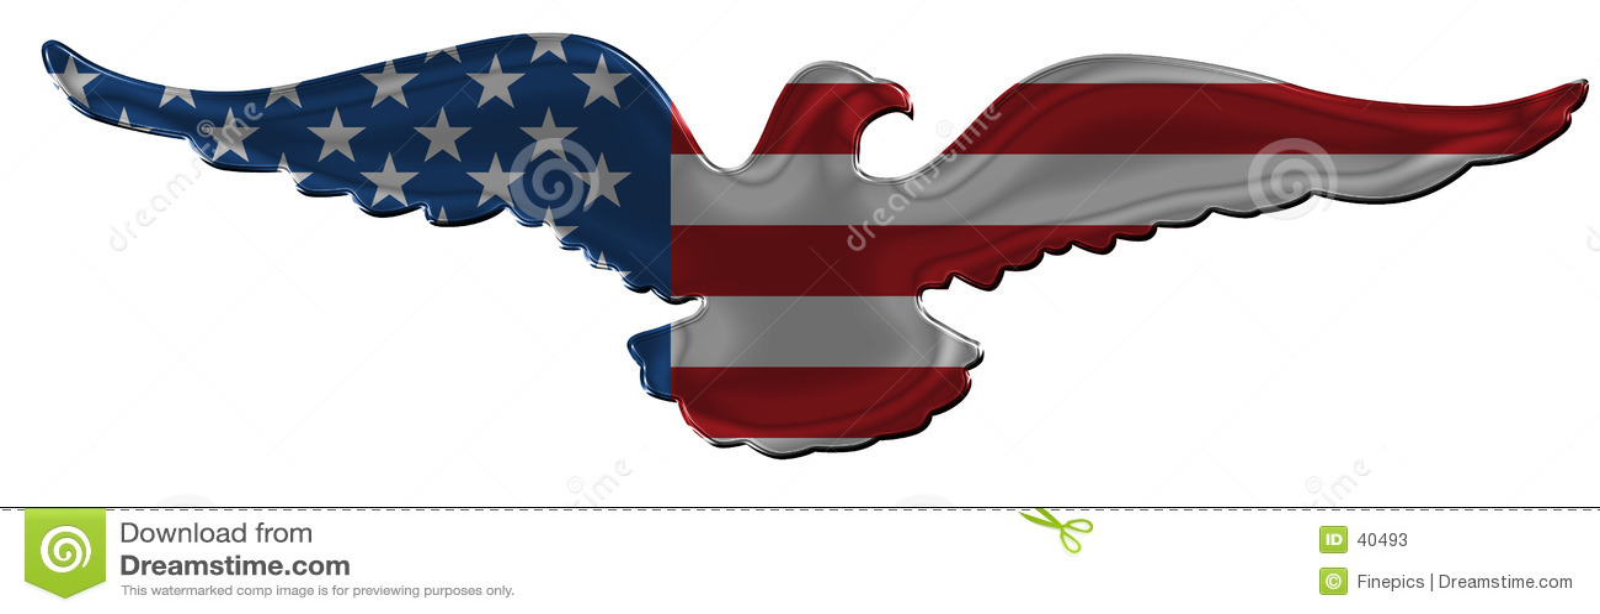 American Eagle Badge 2